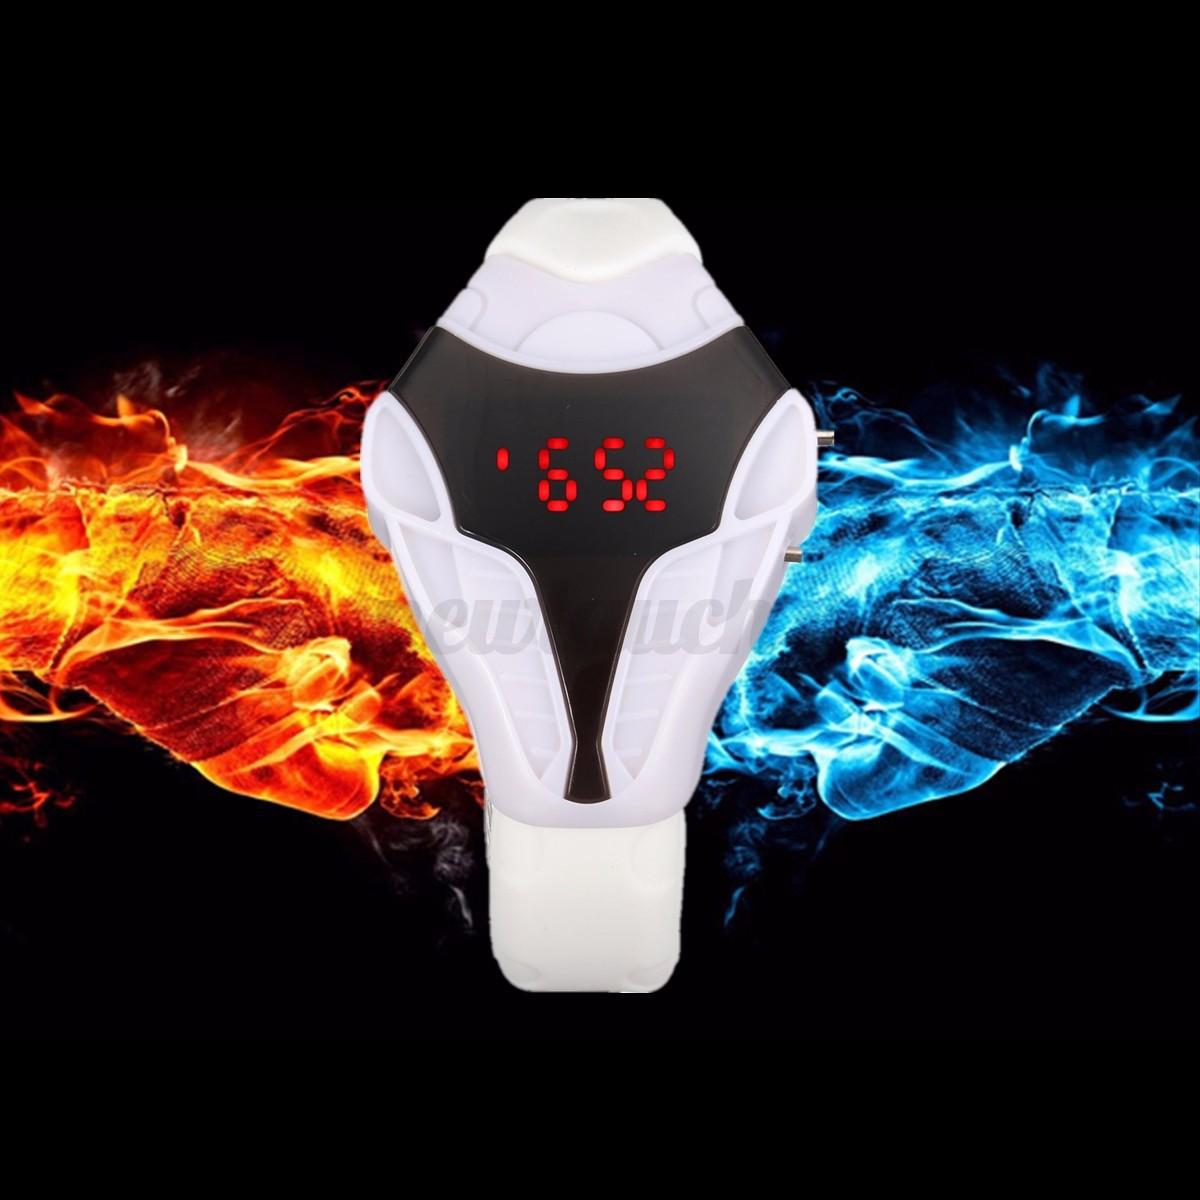 Fashion Digital LED Watch Cobra Triangle Dial Silicone Wrist Watches Halloween